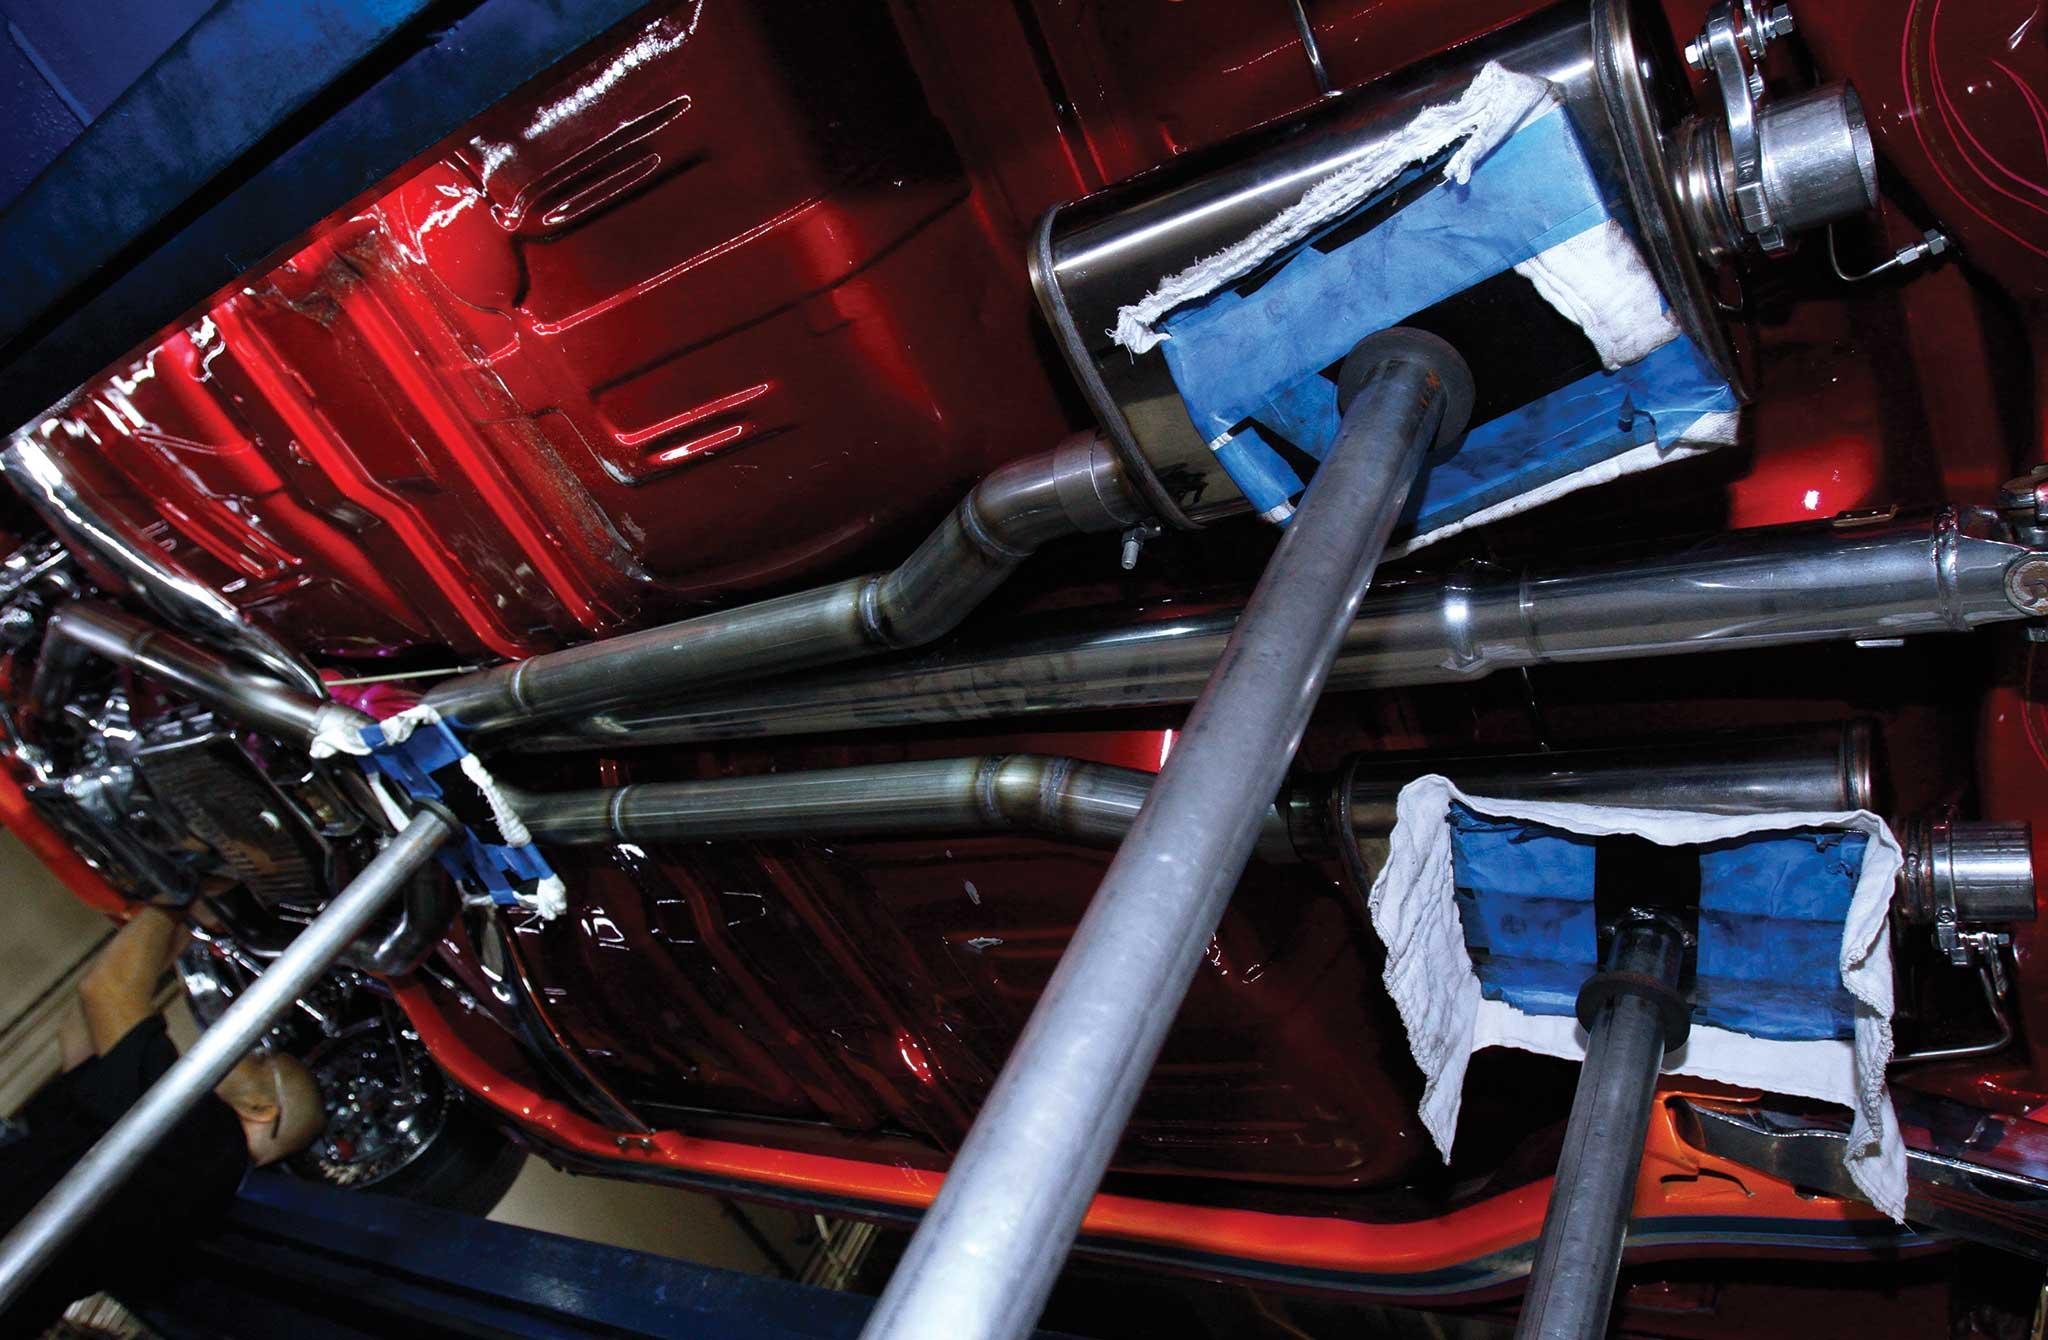 009 magnaflow exhaust install stainless steel mufflers